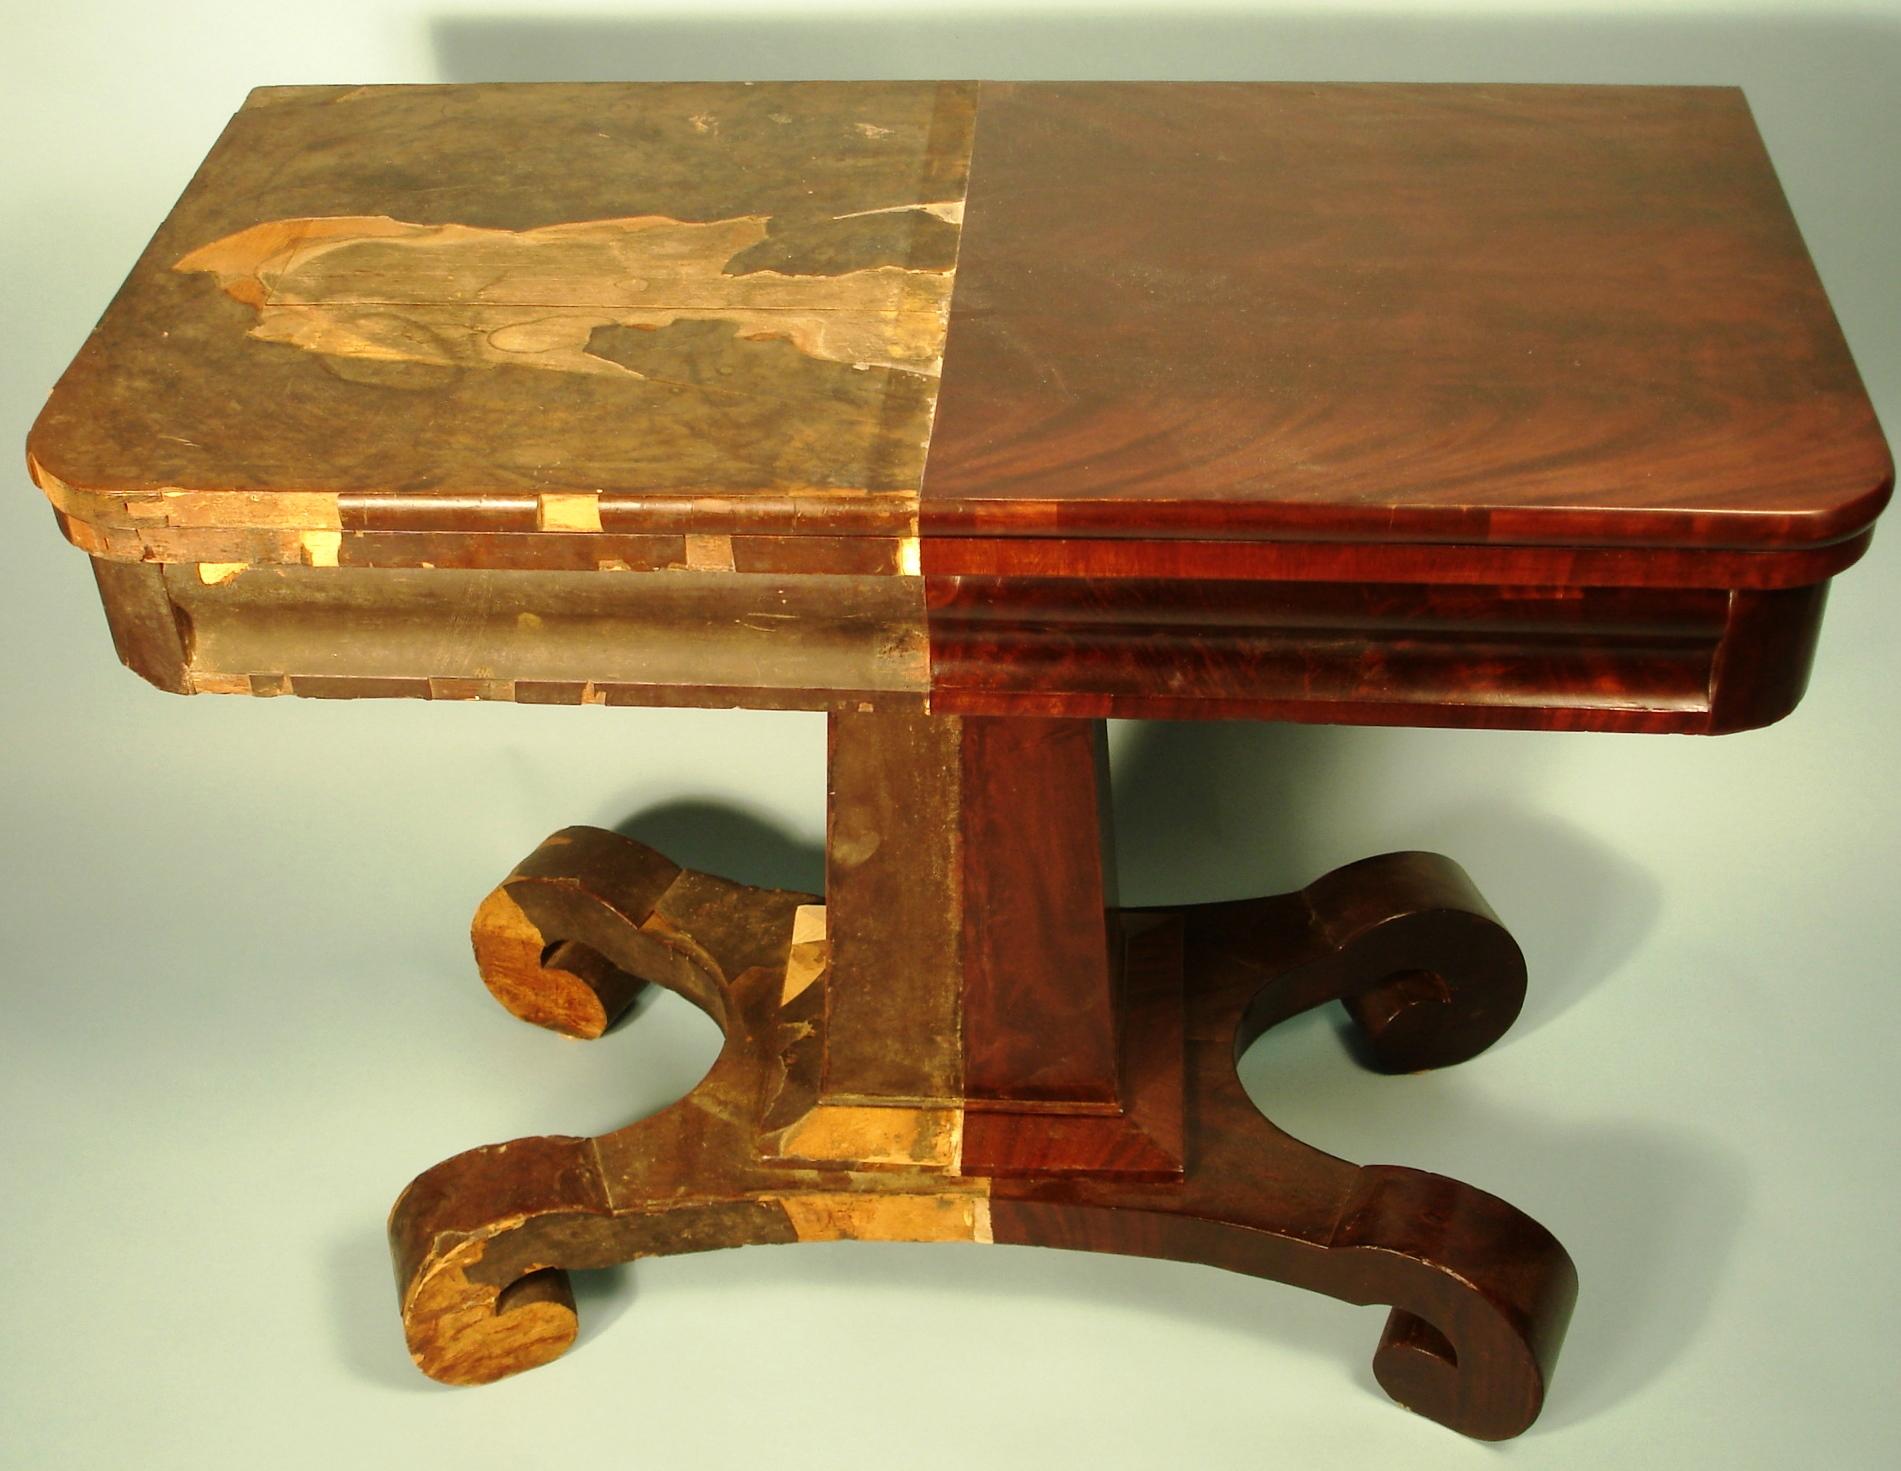 Stunning Gallery of refinishing antique furniture refinishing antique furniture